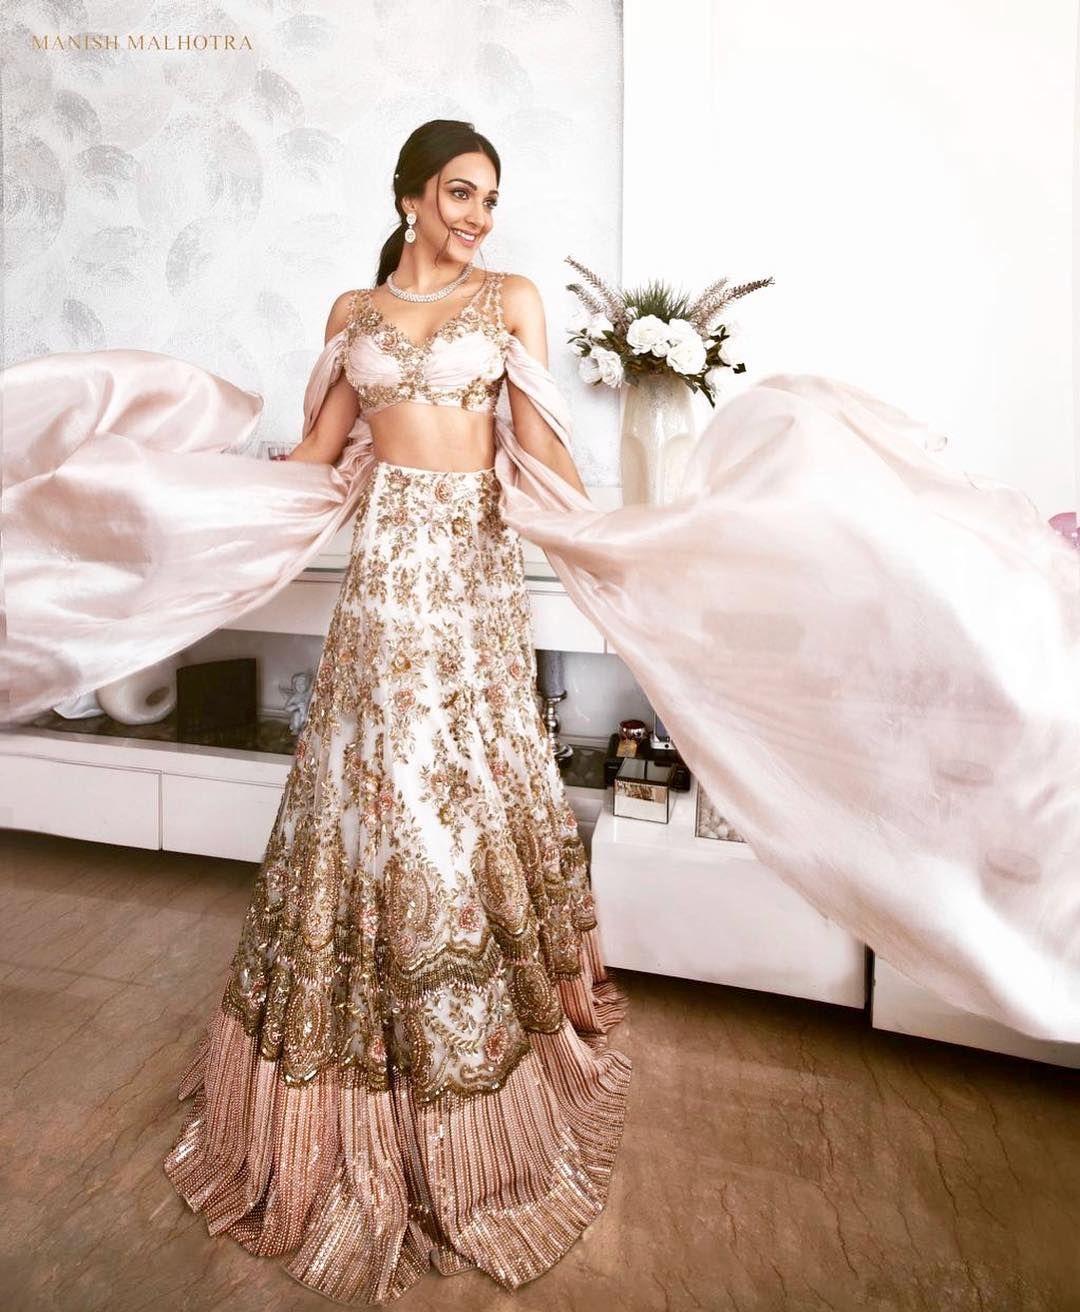 Pin By Amrita Prakash On Desi Style Backless Wedding Dress Lengha Bridal Indian Wedding Outfits Amrita prakash nice pics hd wallpaper